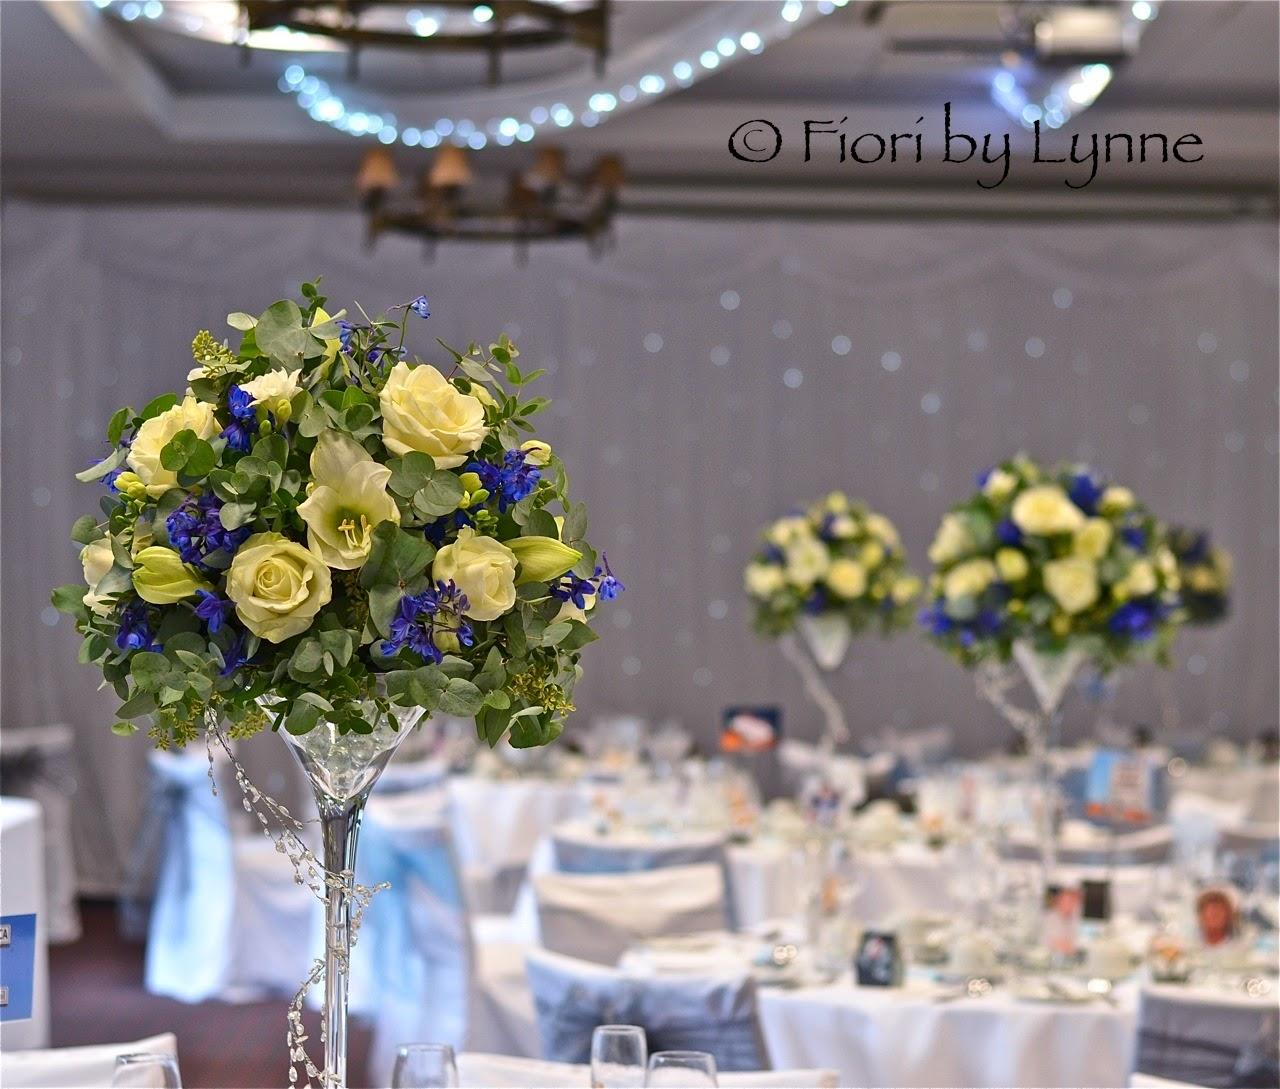 Wedding Flowers In February: Wedding Flowers Blog: February 2014